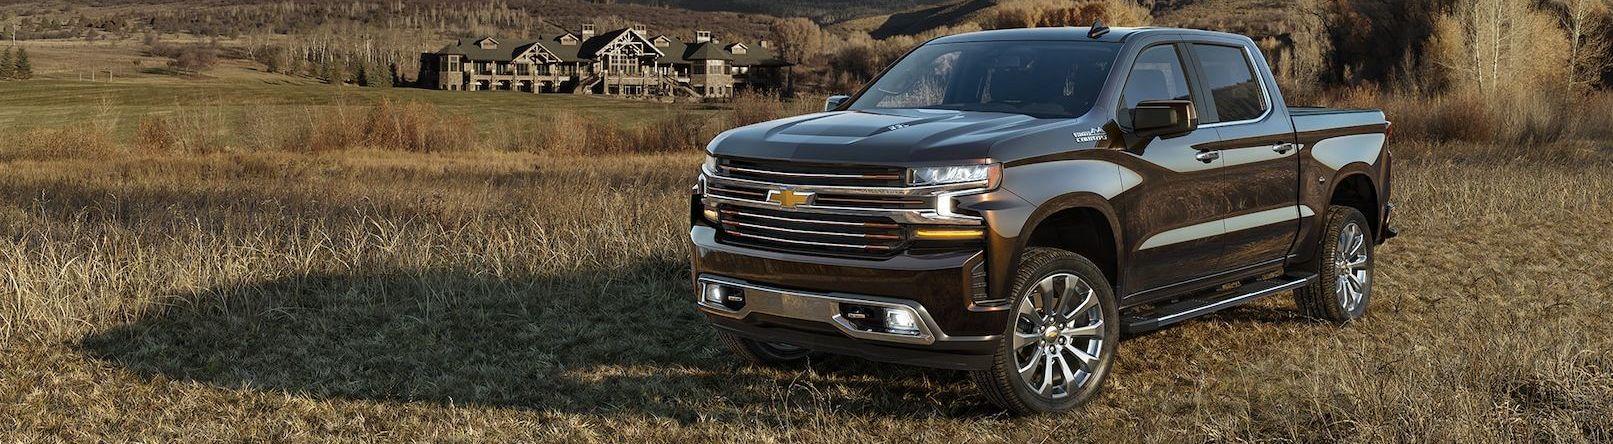 2019 Chevrolet Silverado 1500 for Sale near Brookings, SD